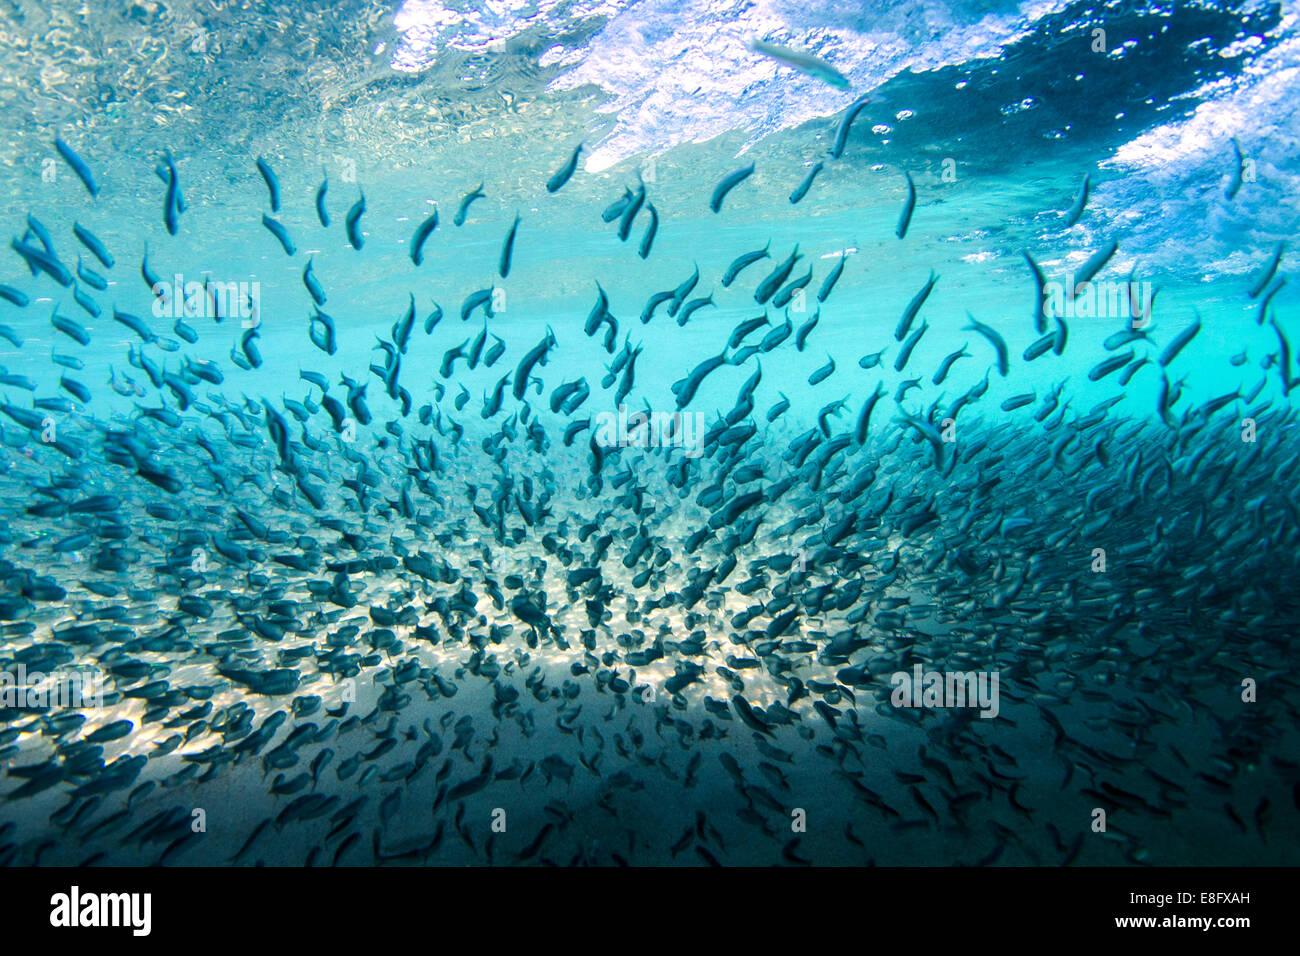 School of fish underwater - Stock Image